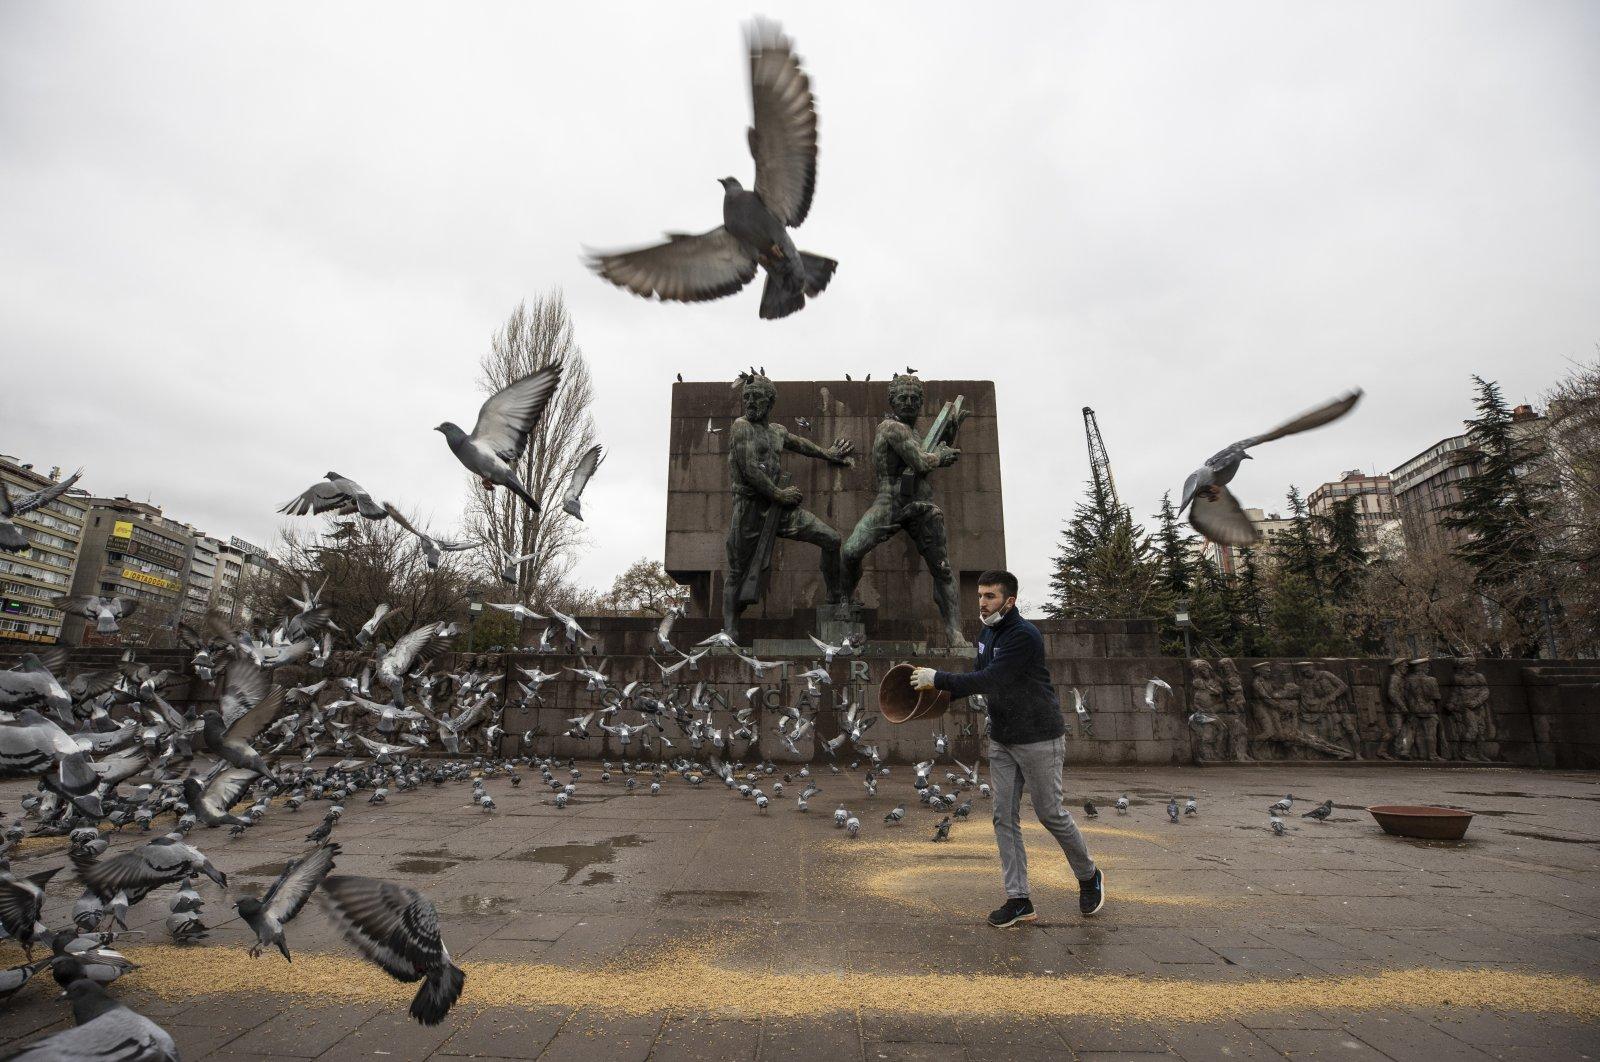 A man feeds birds at the July 15 Kızılay National Will Square in Ankara, Turkey, Jan. 1, 2021. (AA)